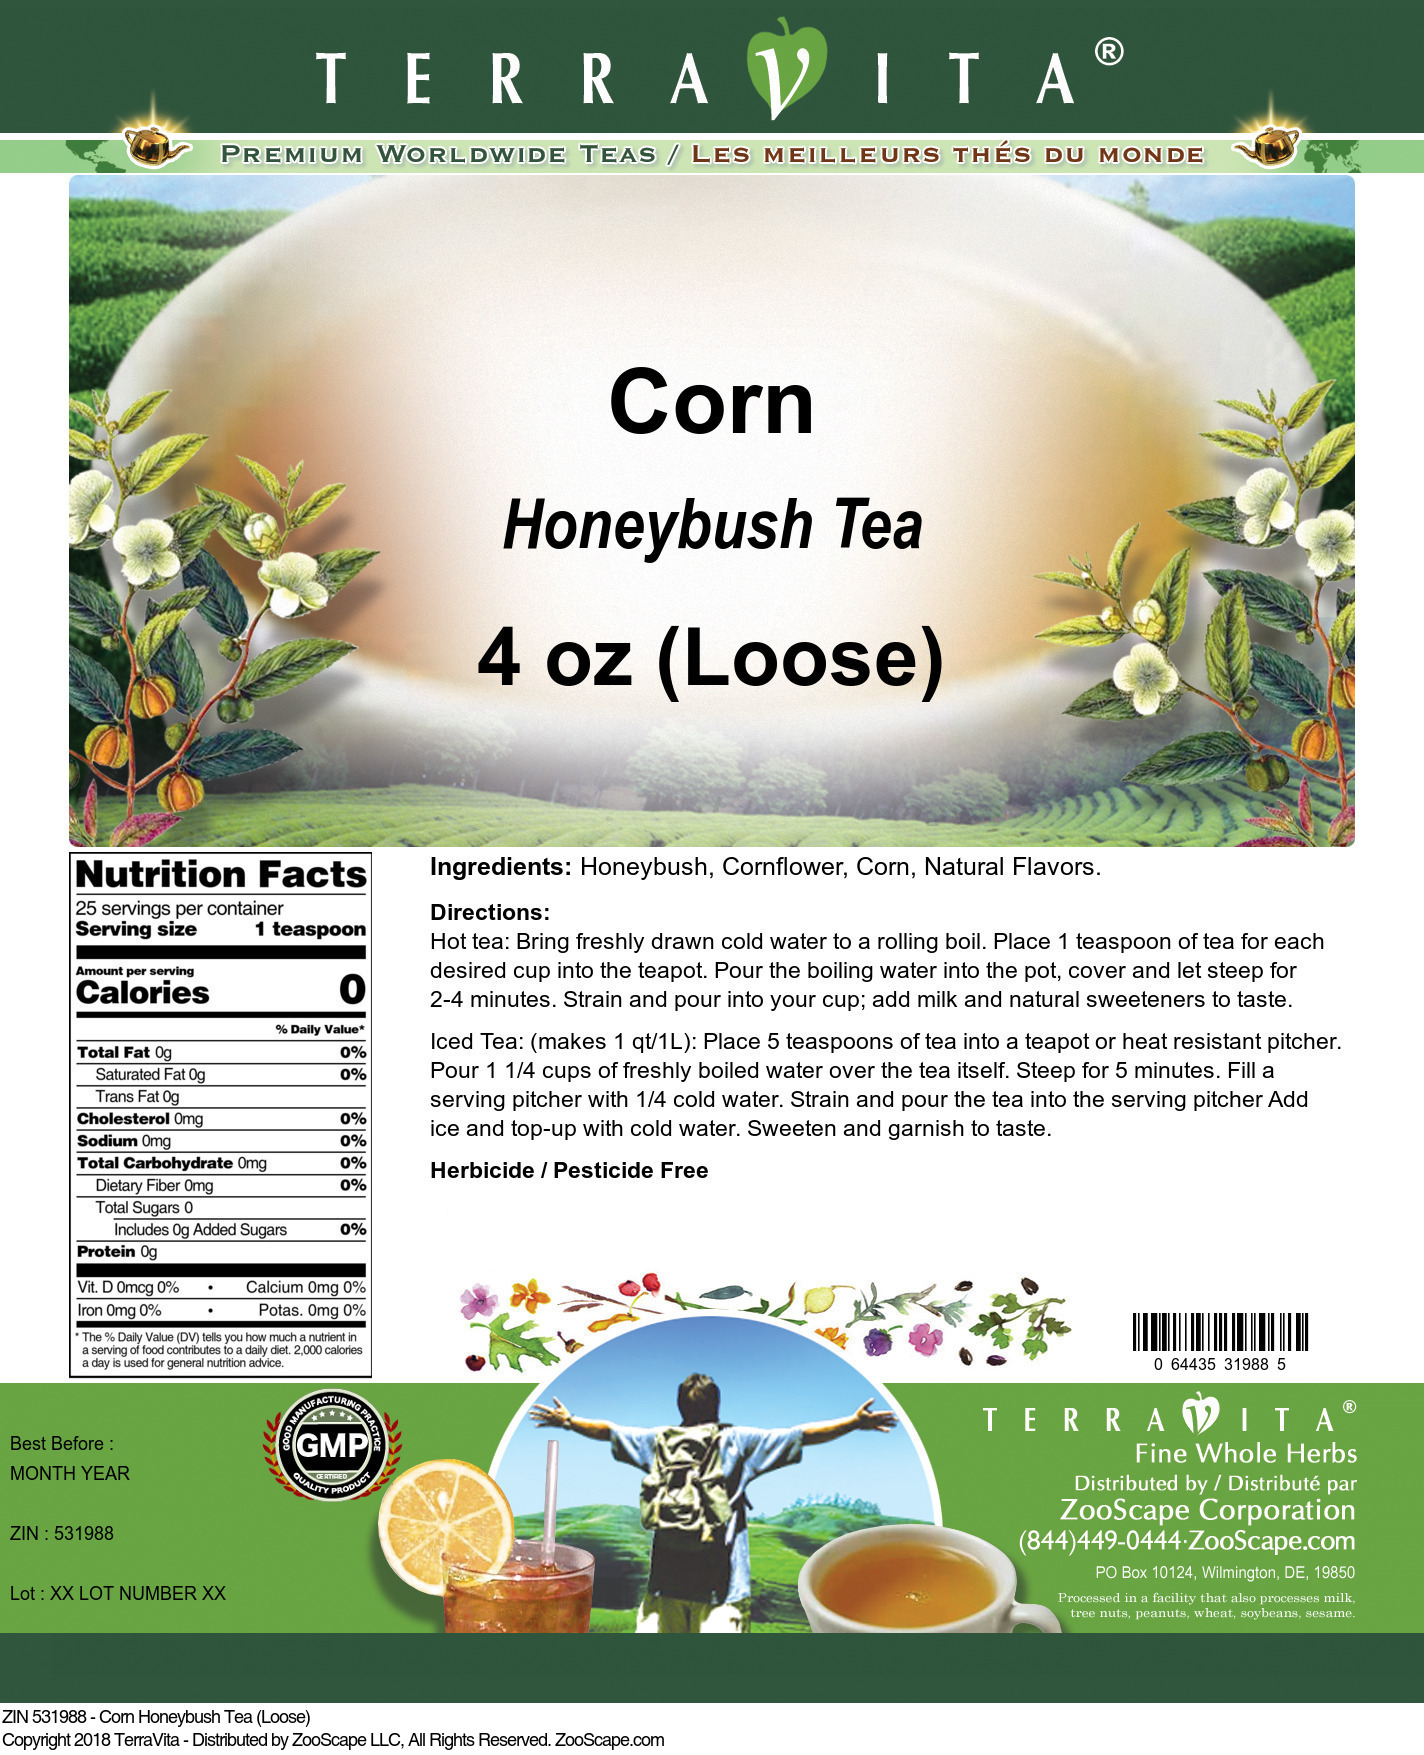 Corn Honeybush Tea (Loose)